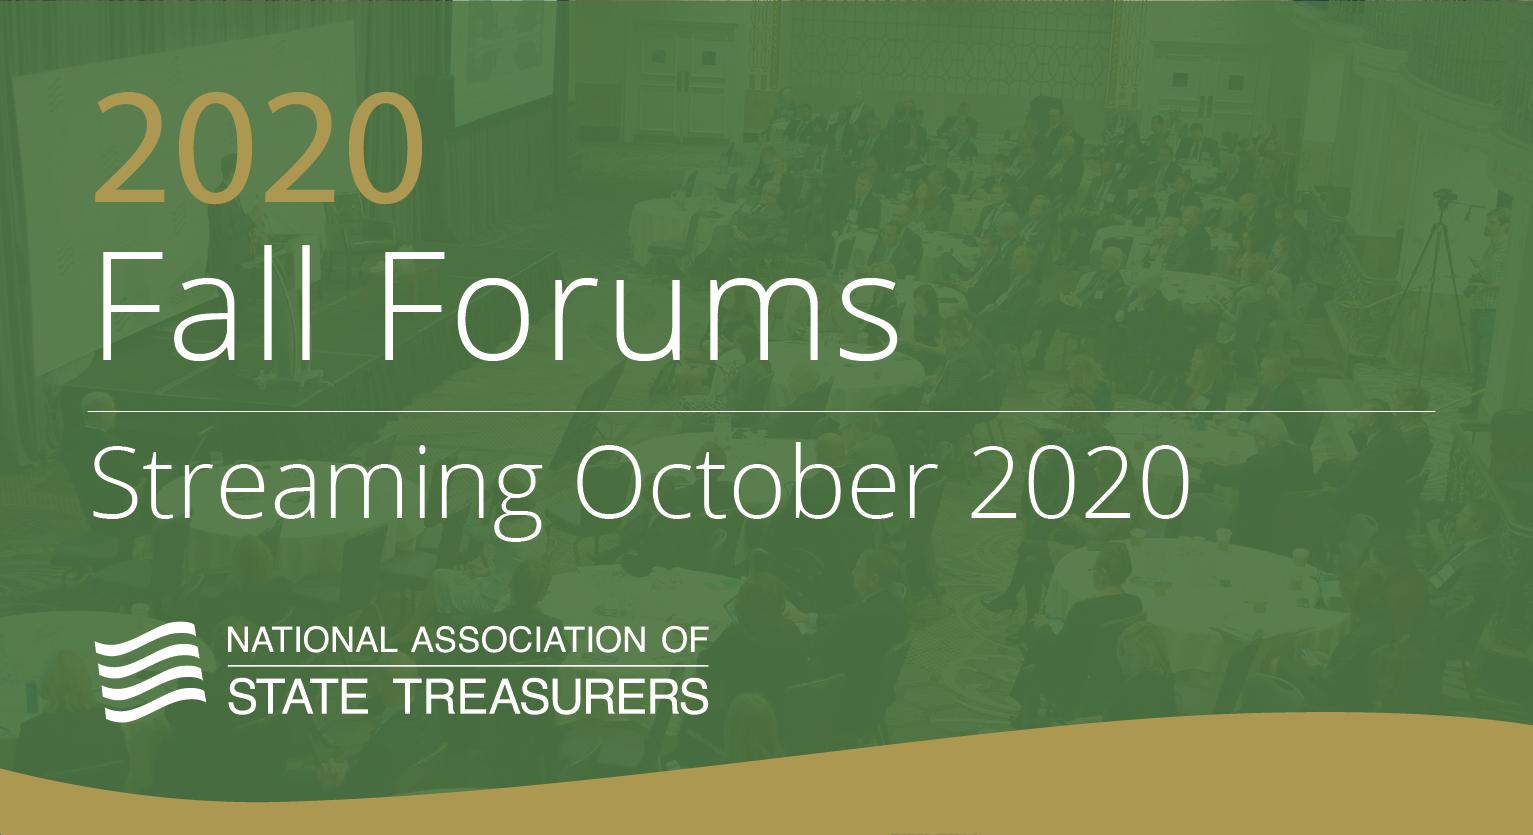 NAST Fall Forum